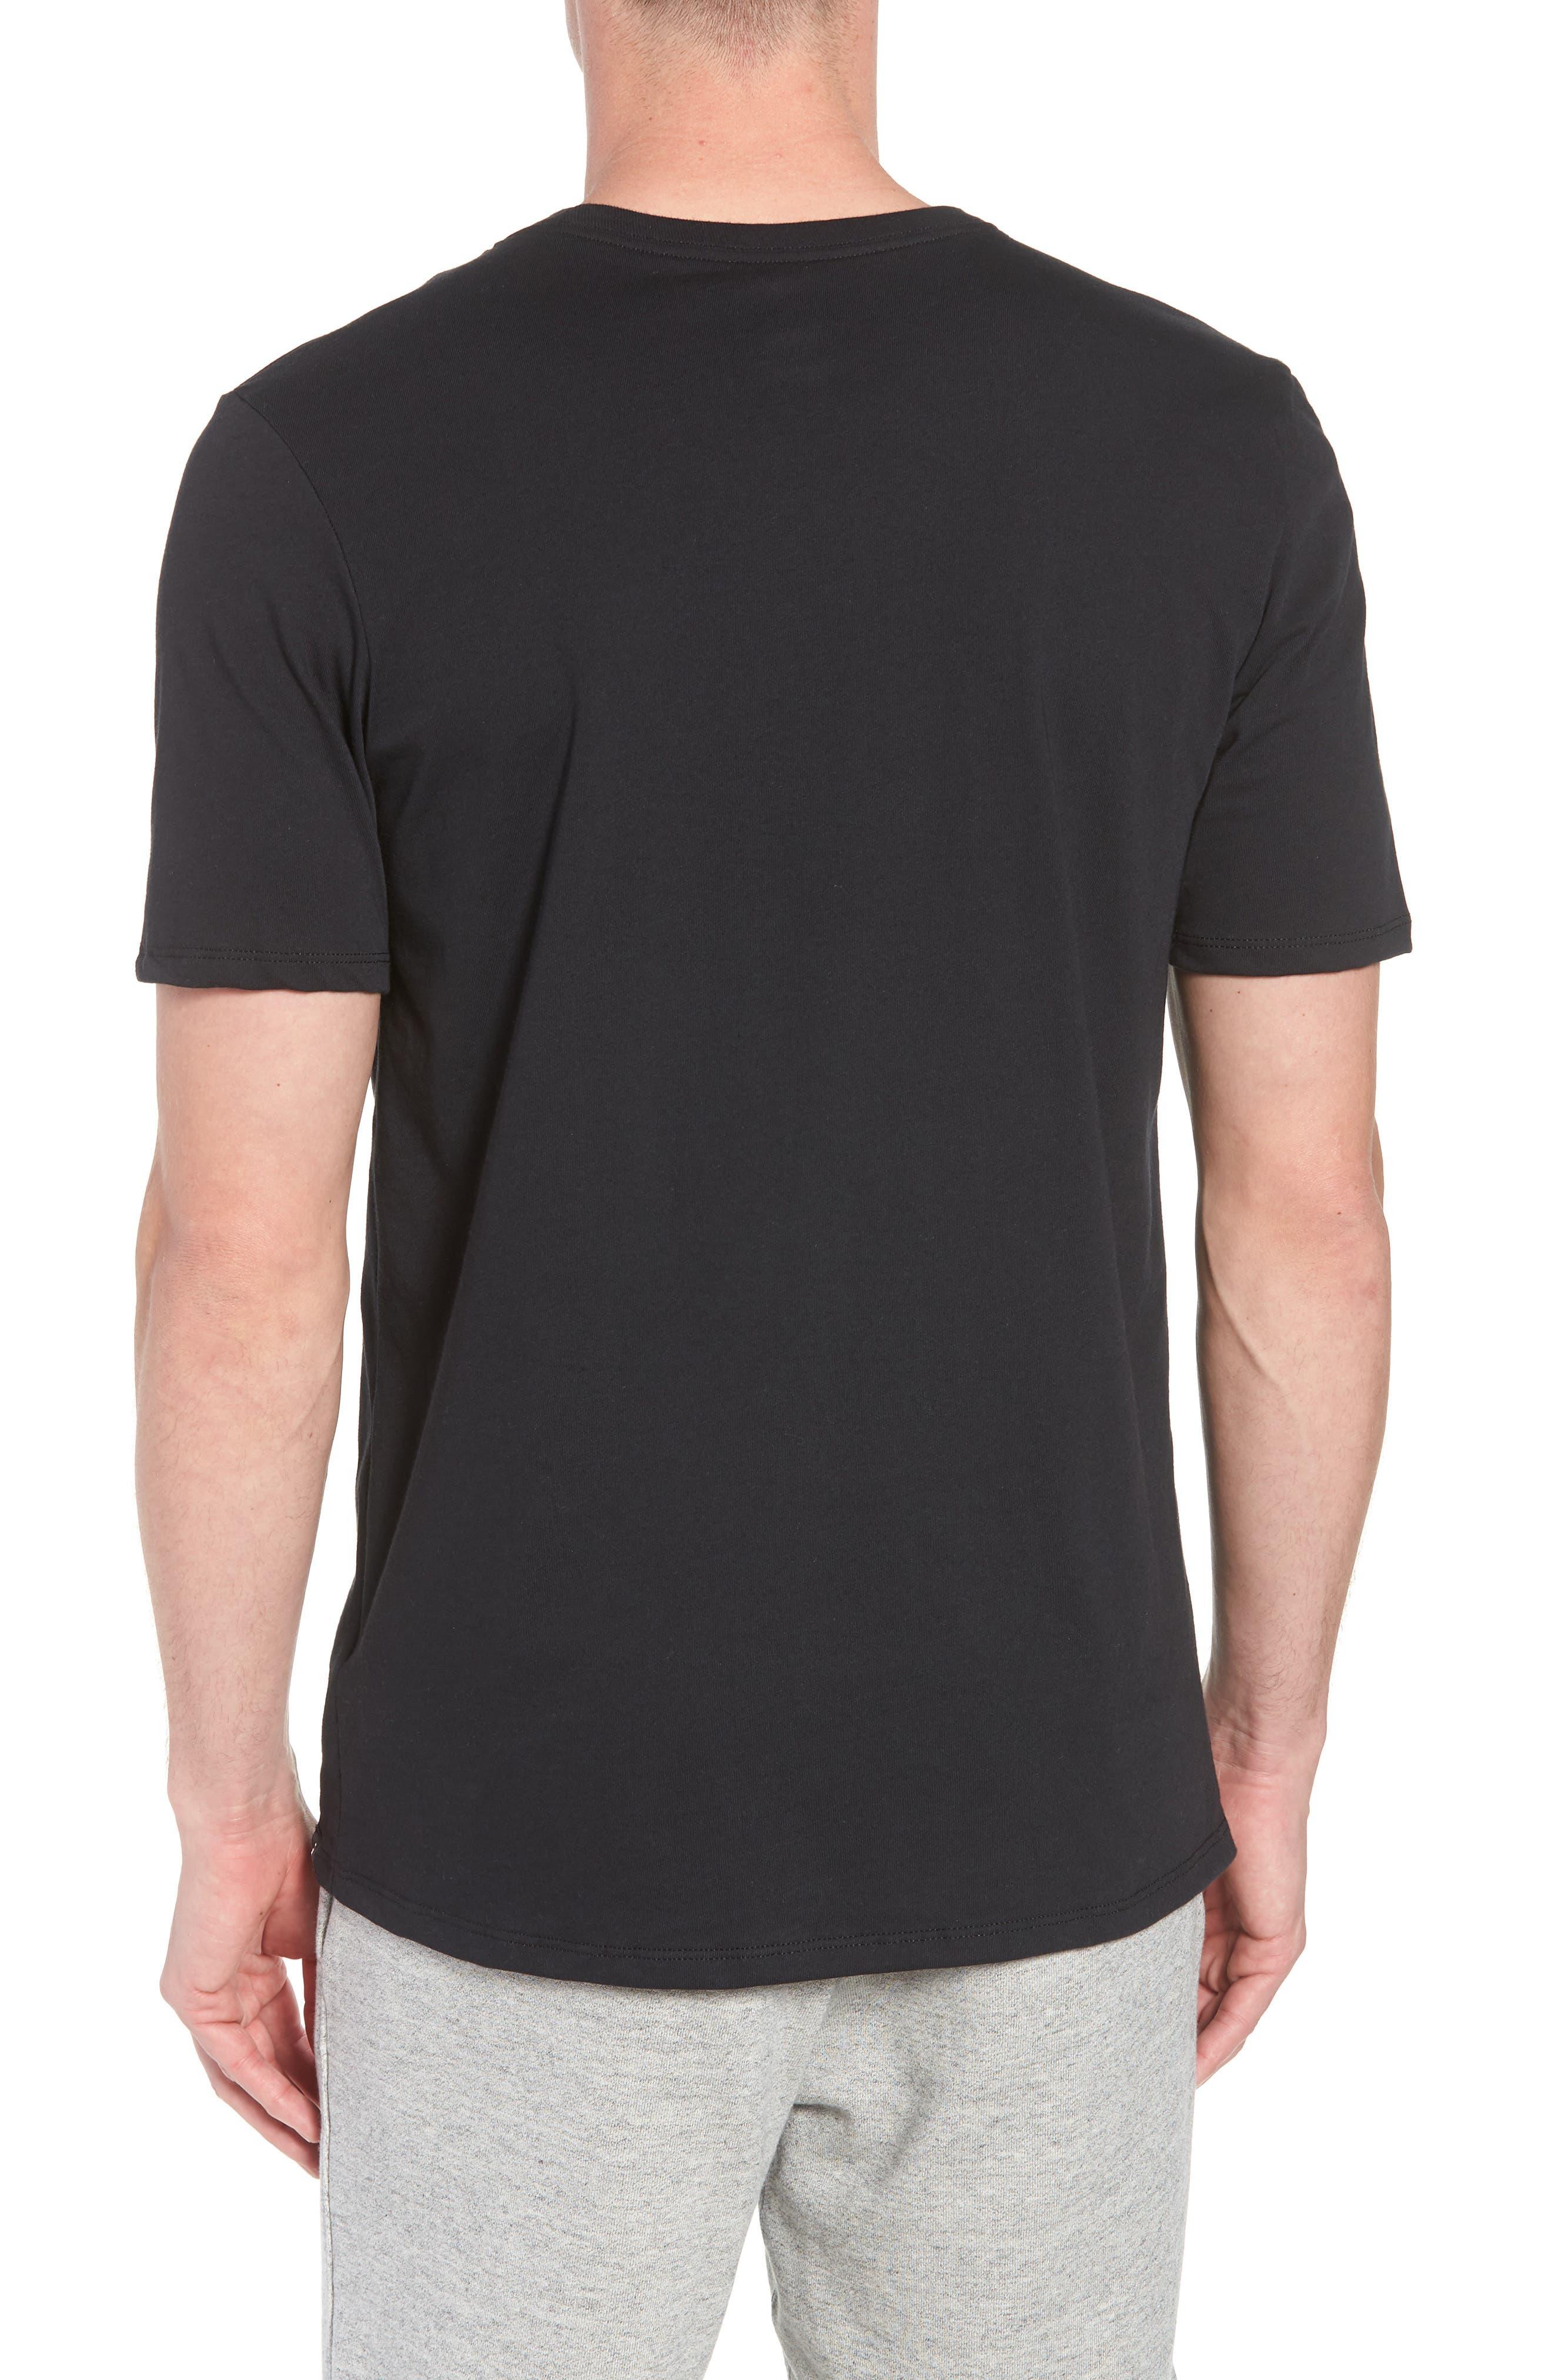 Iconic Jumpman Graphic T-Shirt,                             Alternate thumbnail 2, color,                             Black/ White